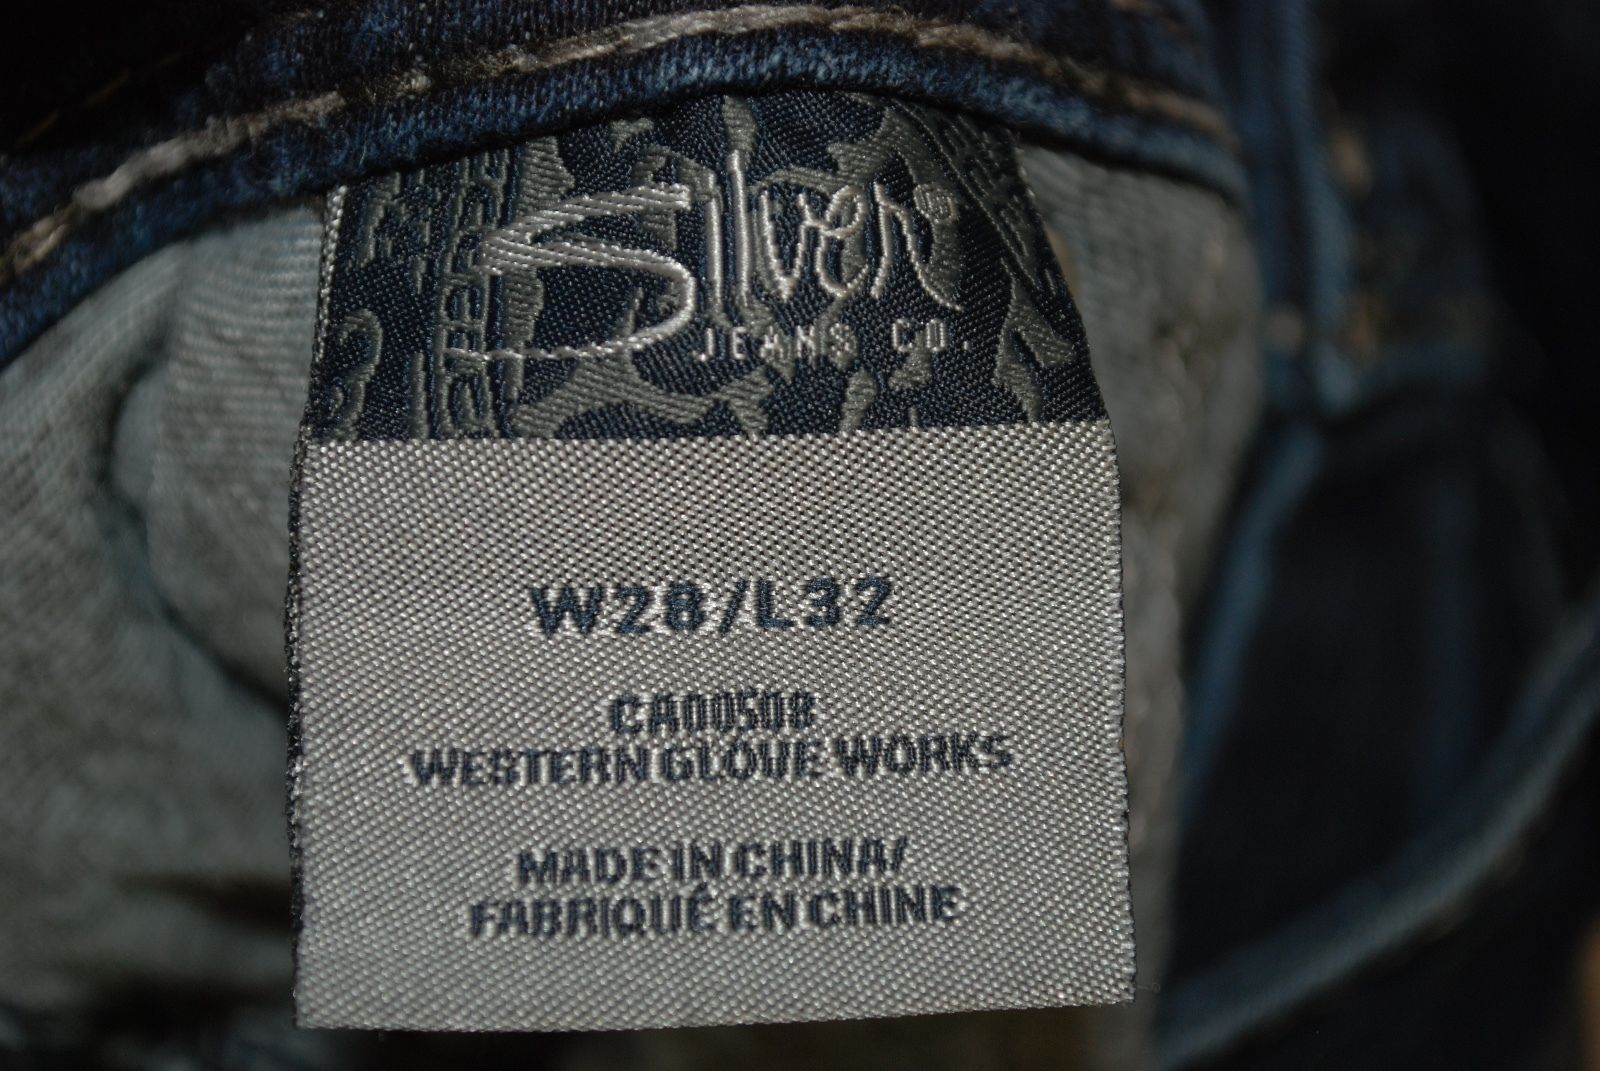 SILVER JEANS - Suki Surplus - Dark Wash Bootcut Flap Pocket Women's 28W x 32L